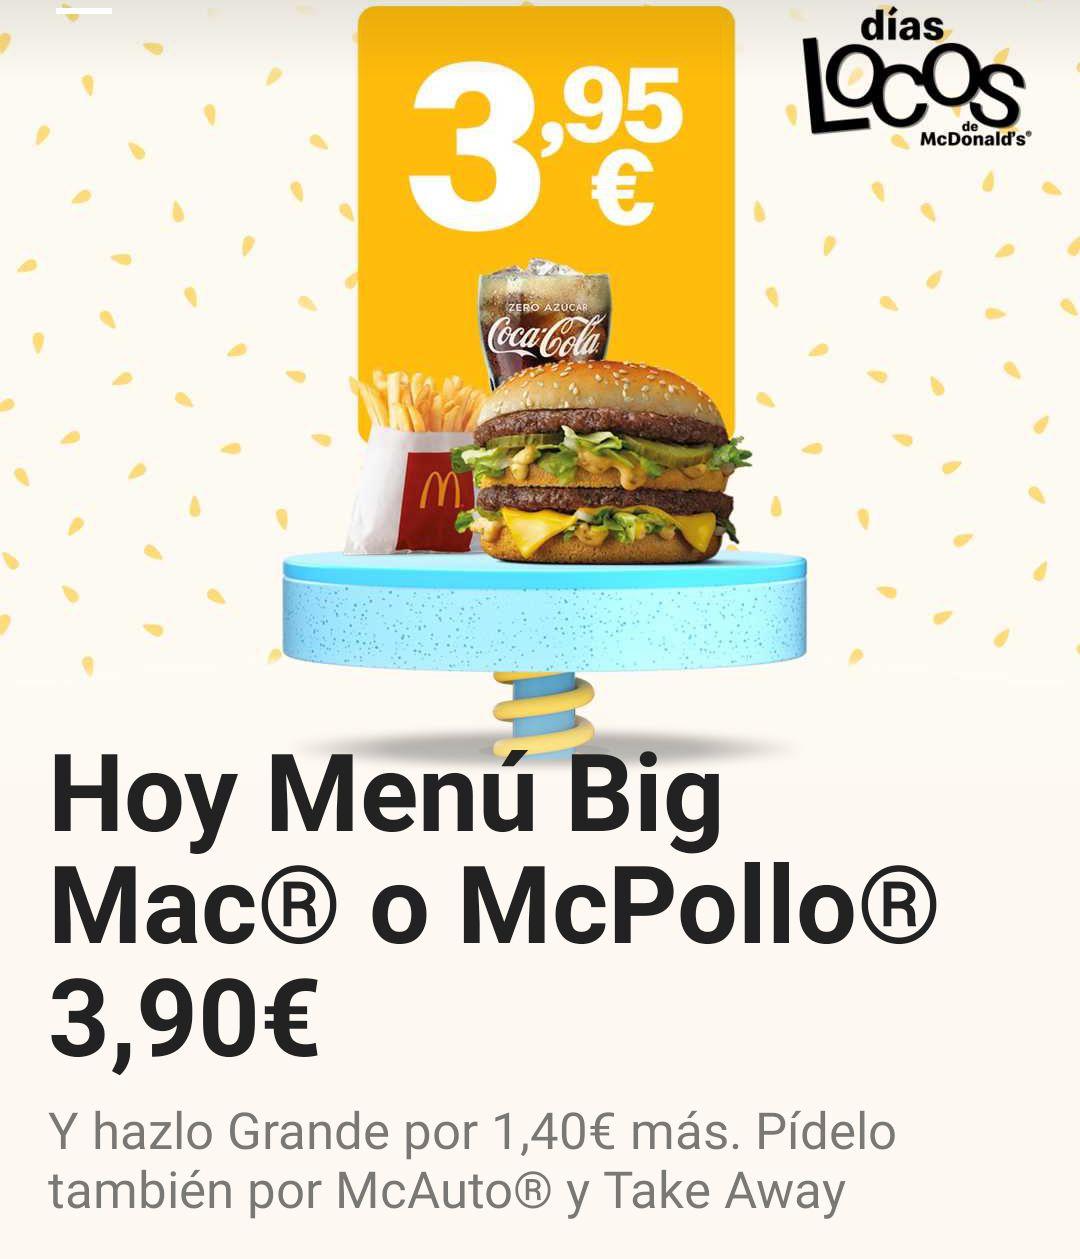 Menú completo Big Mac o McPollo a 3,90€